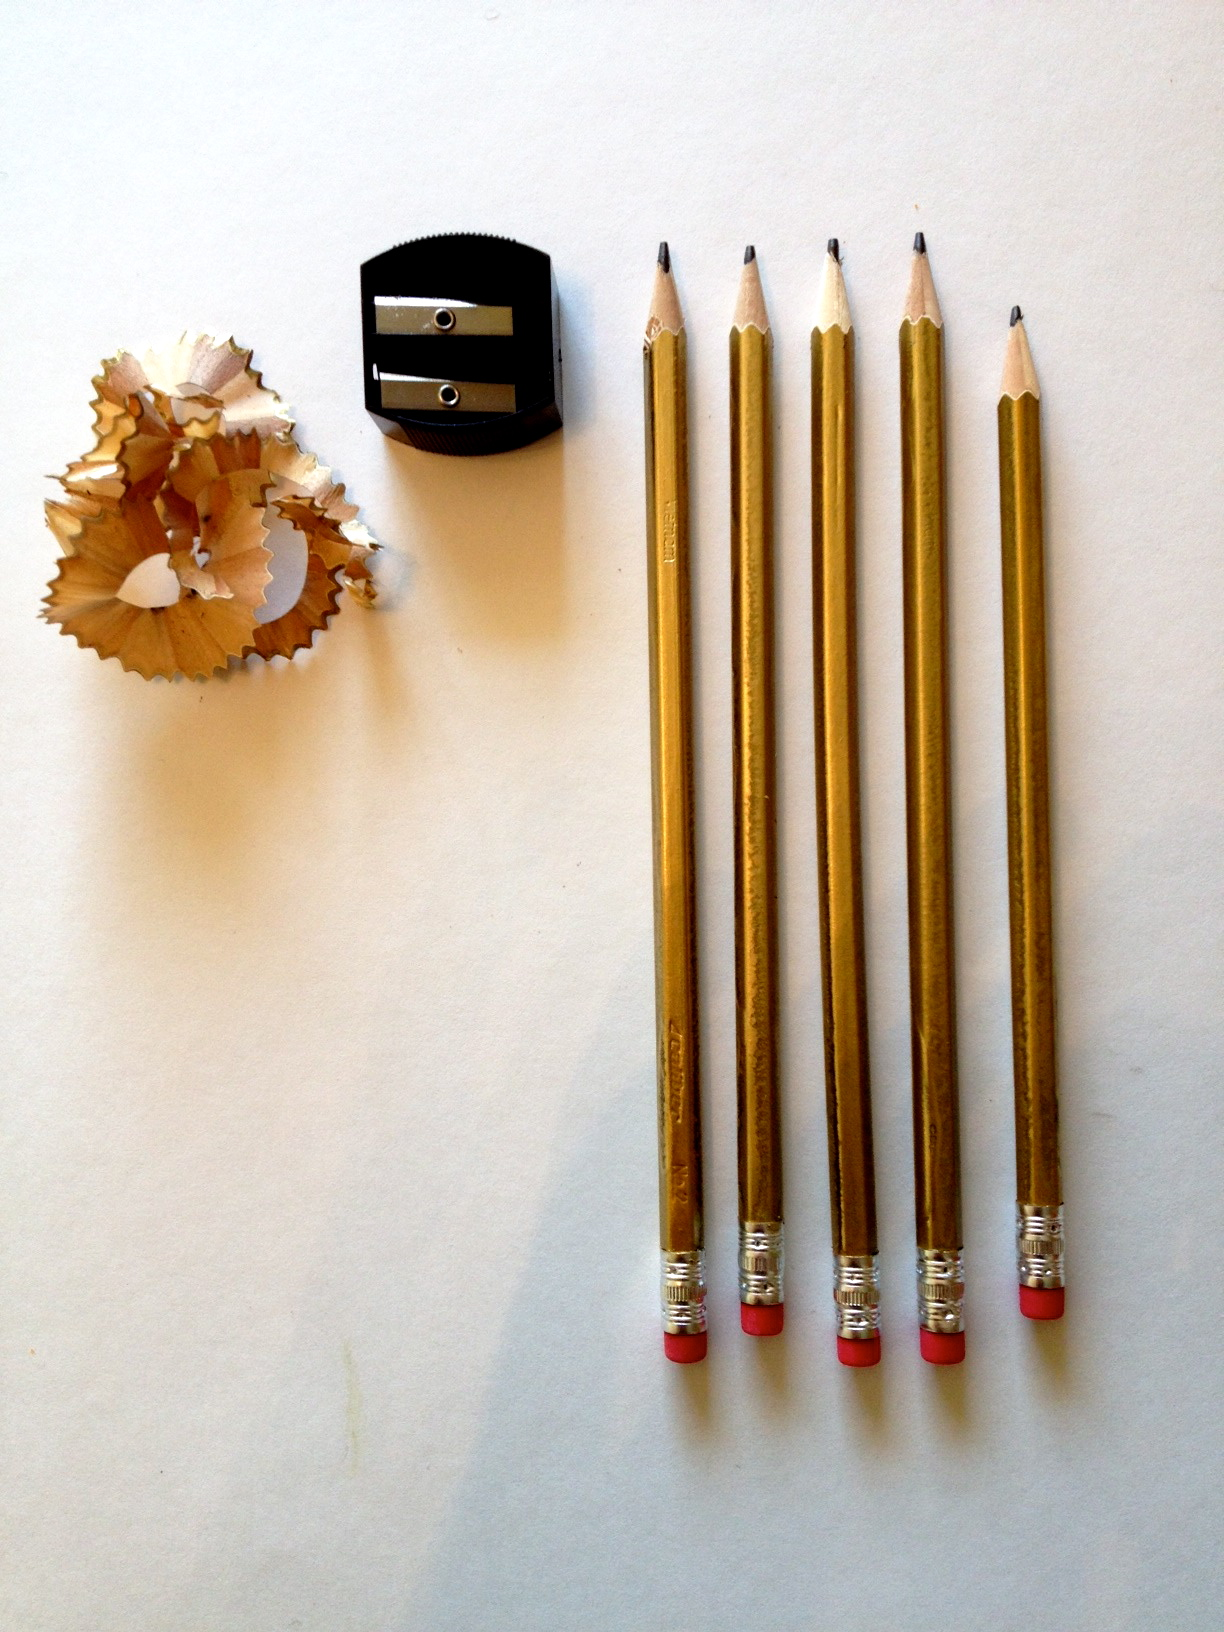 [DIY] Color Block Leather Pencil Holder | J to Z